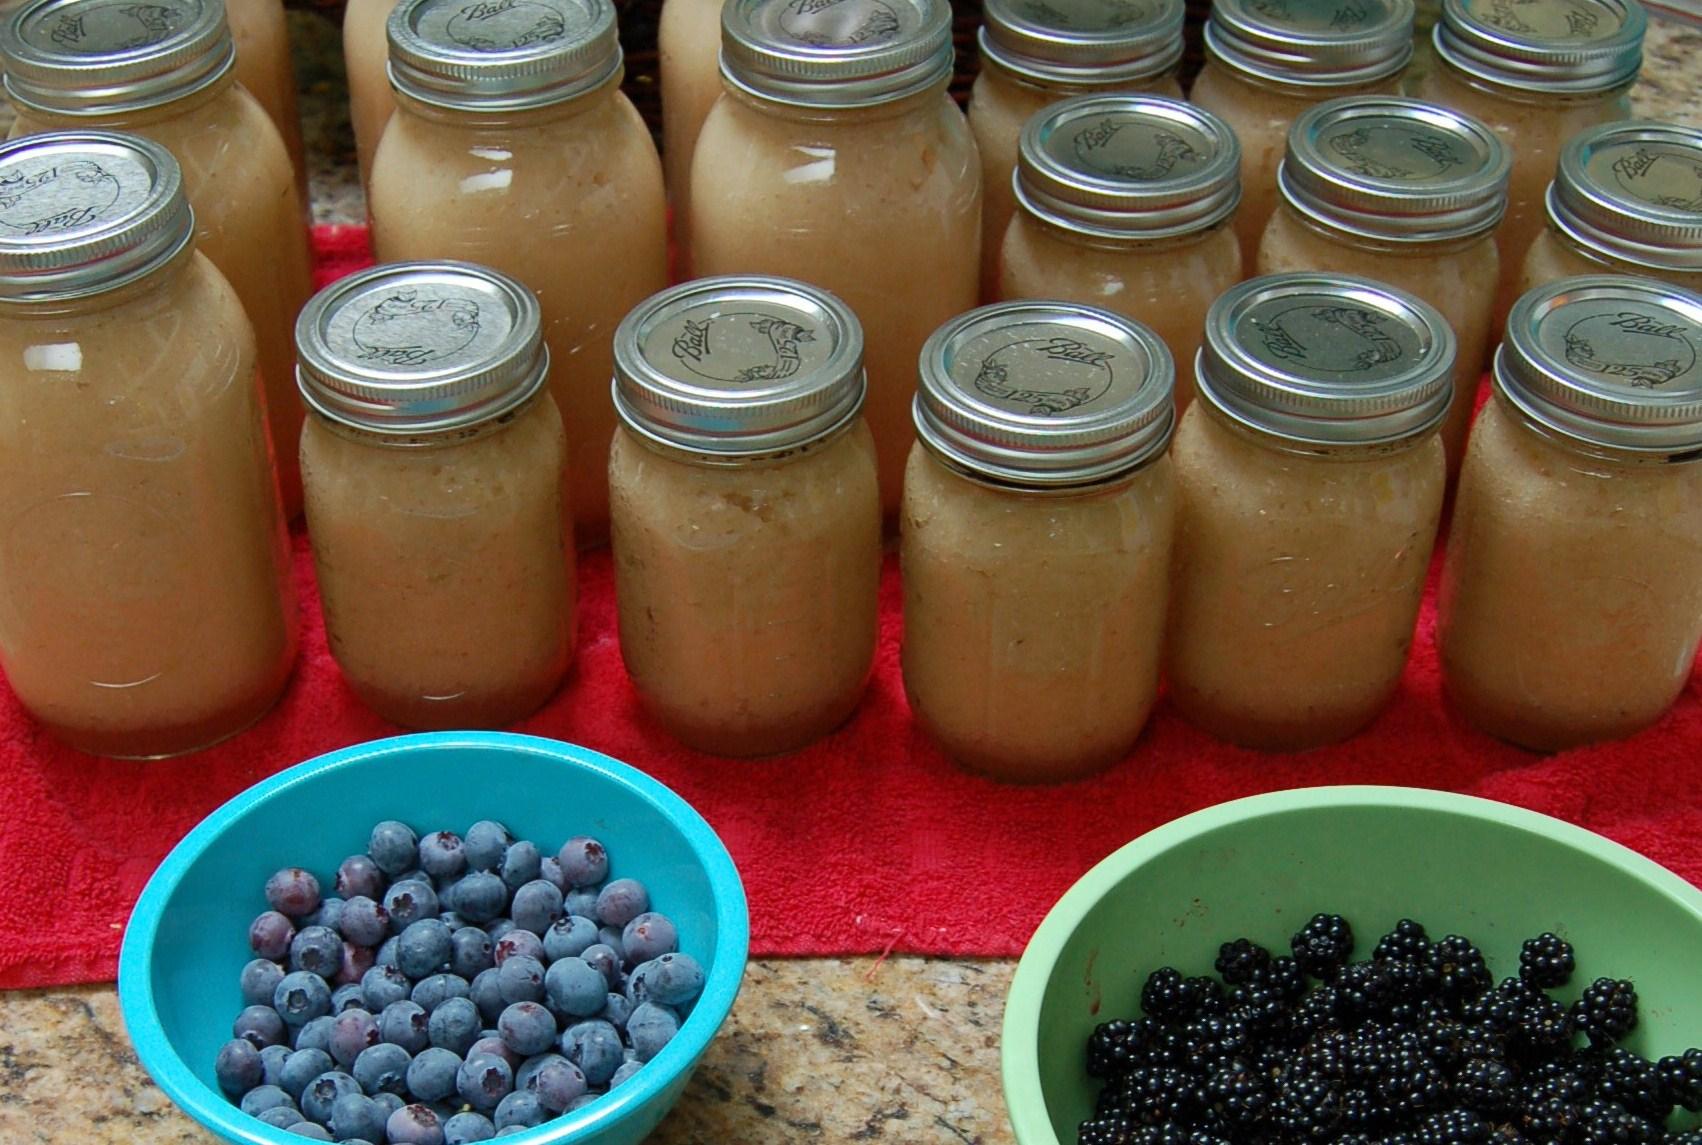 Applesauce, blueberries, and blackberries